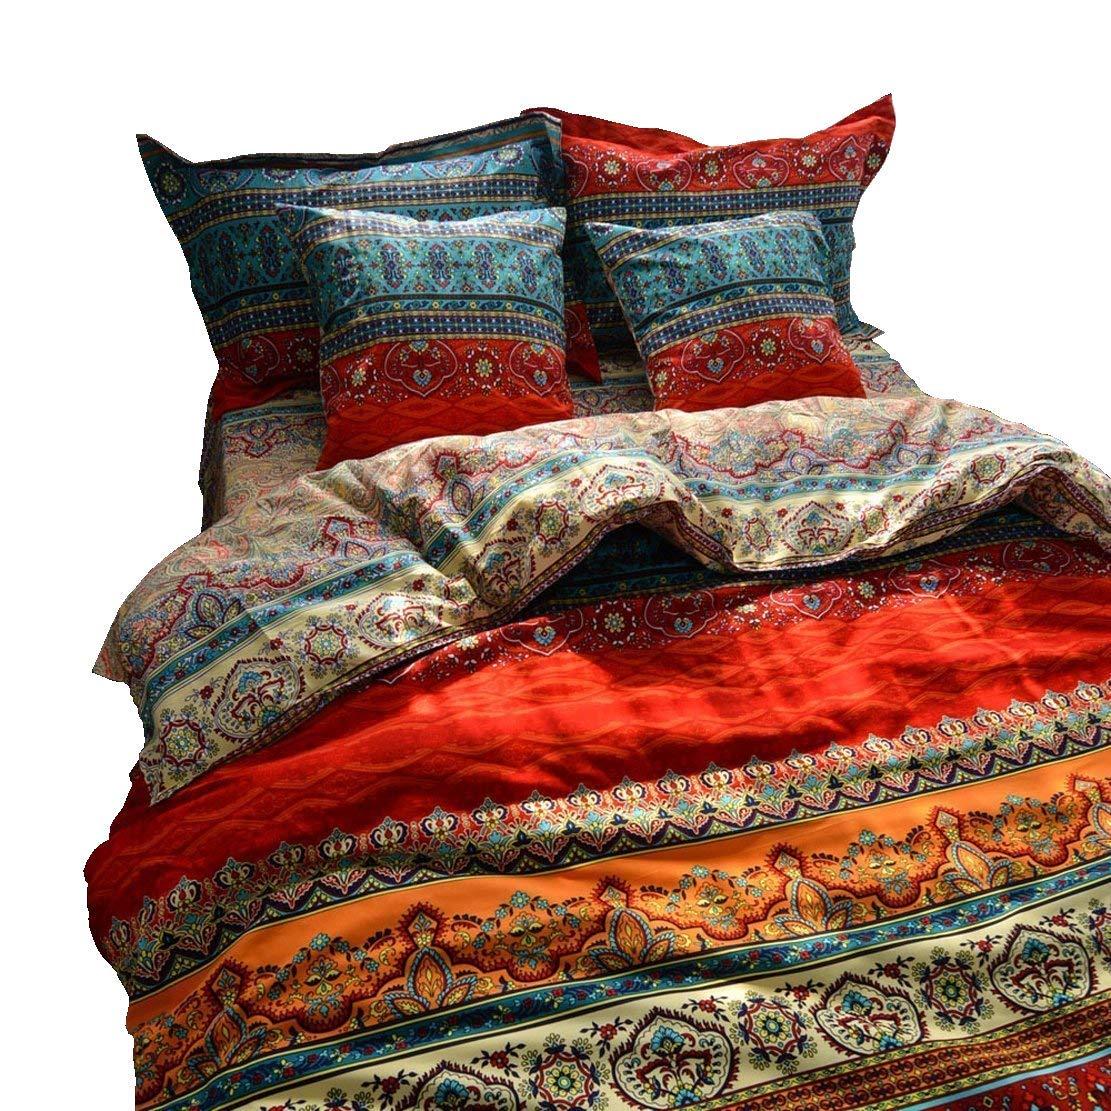 LELVA Boho Duvet Cover Set Queen Colorful Stripe Fitted Sheet Set Bohemian Bedding Set Baroque Style Bedding Set 4pcs